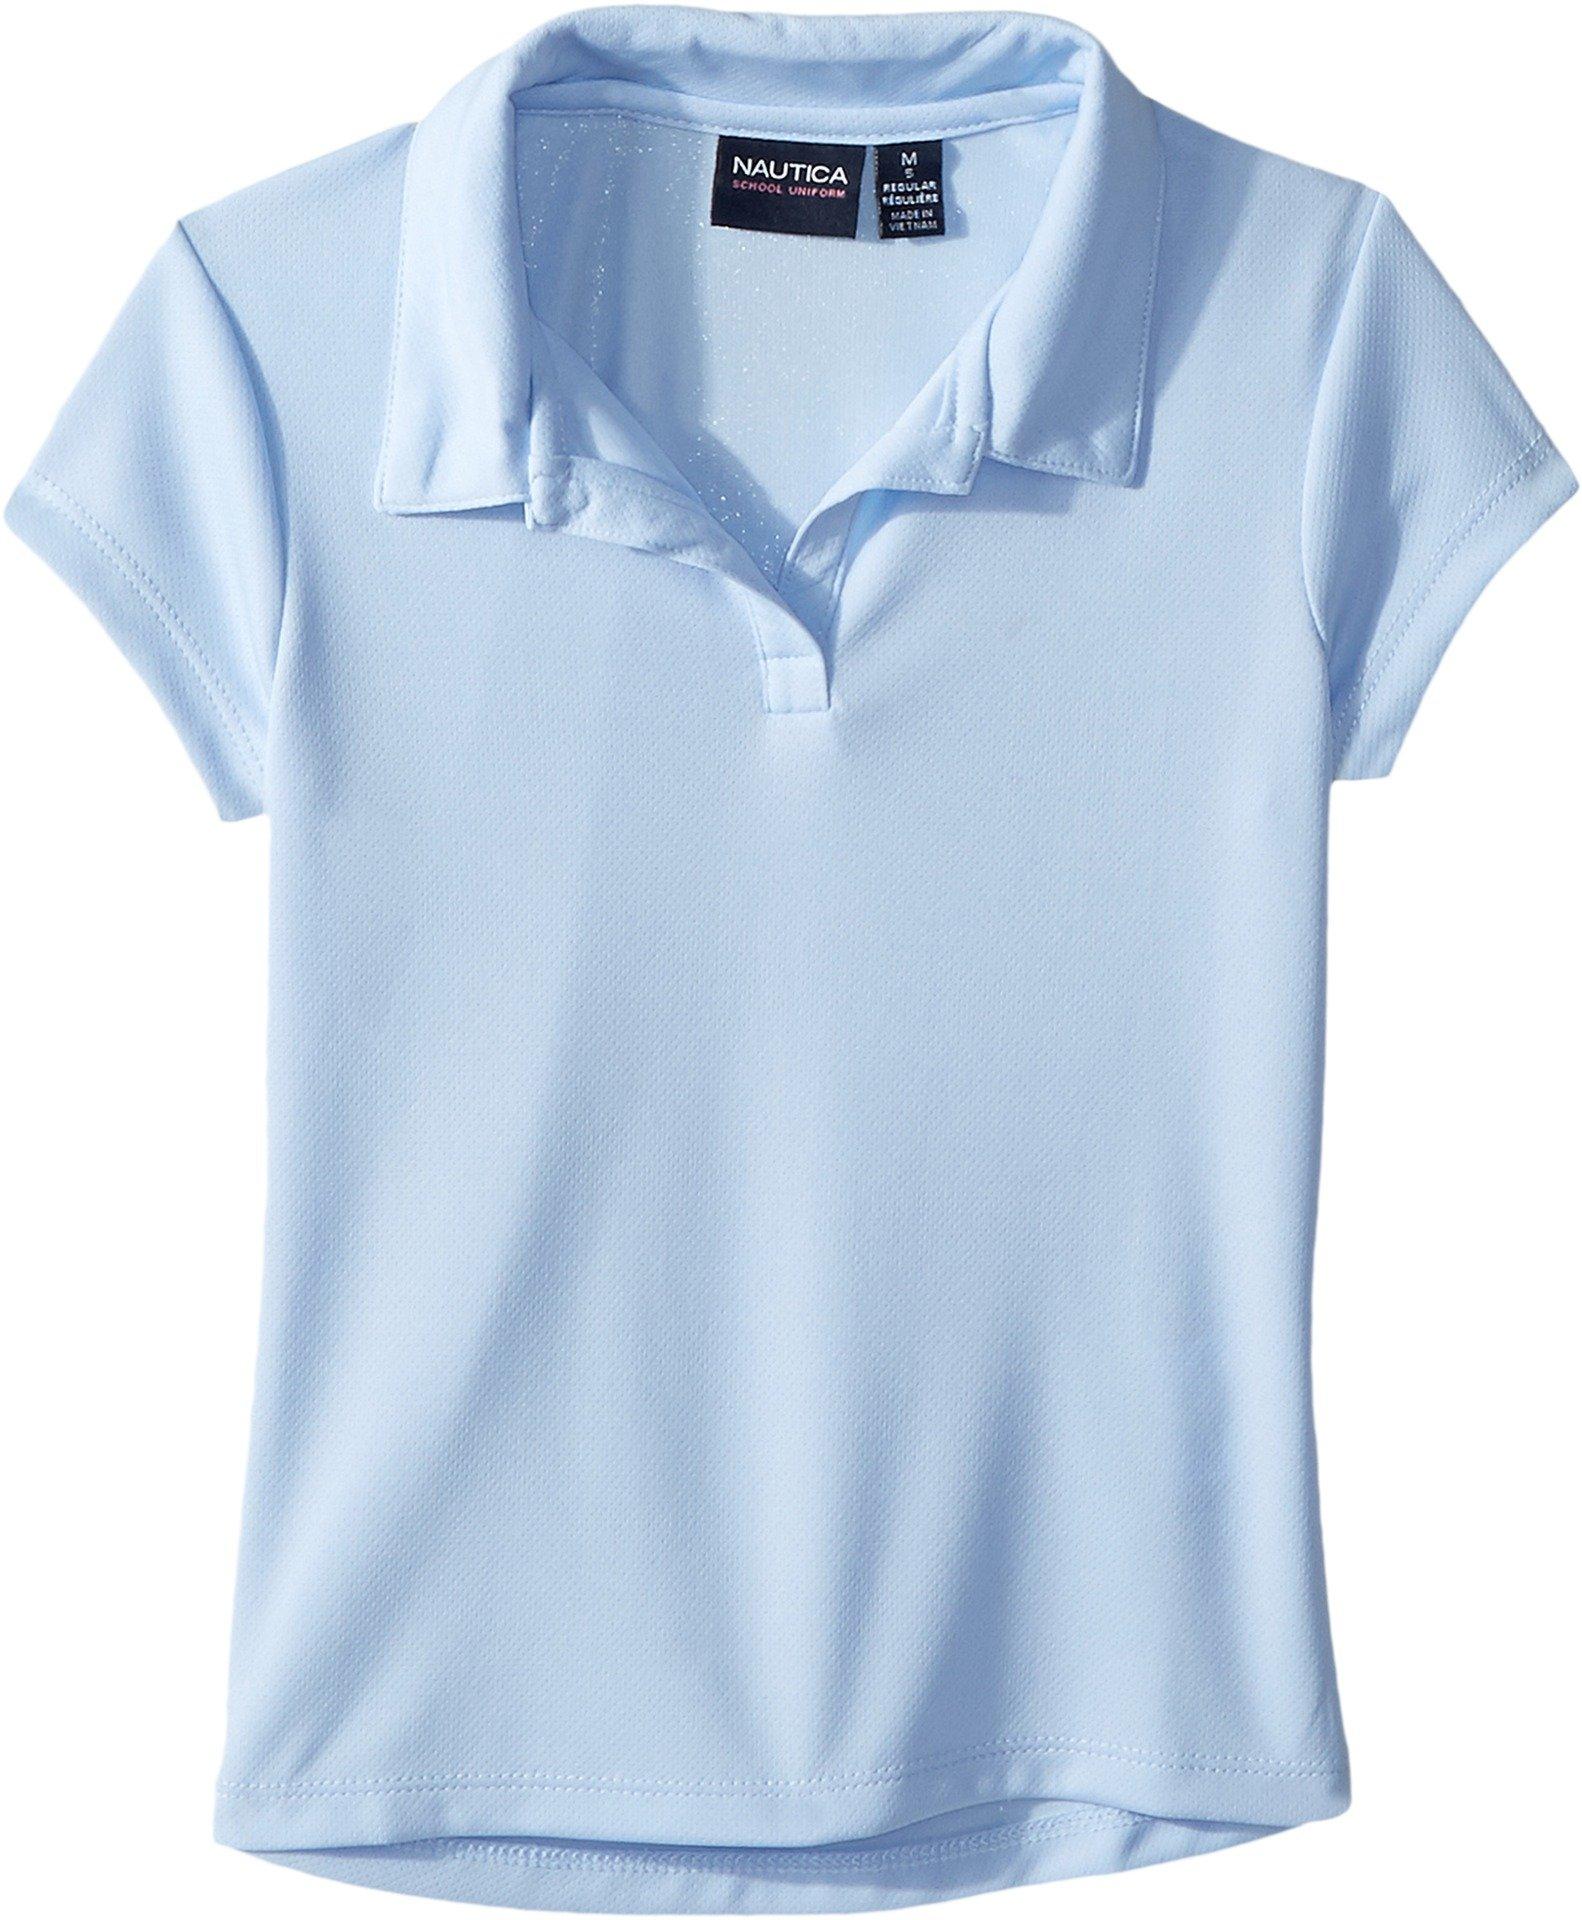 Nautica Little Girls' Short Sleeve Performance Polo, Light Blue, M (5)